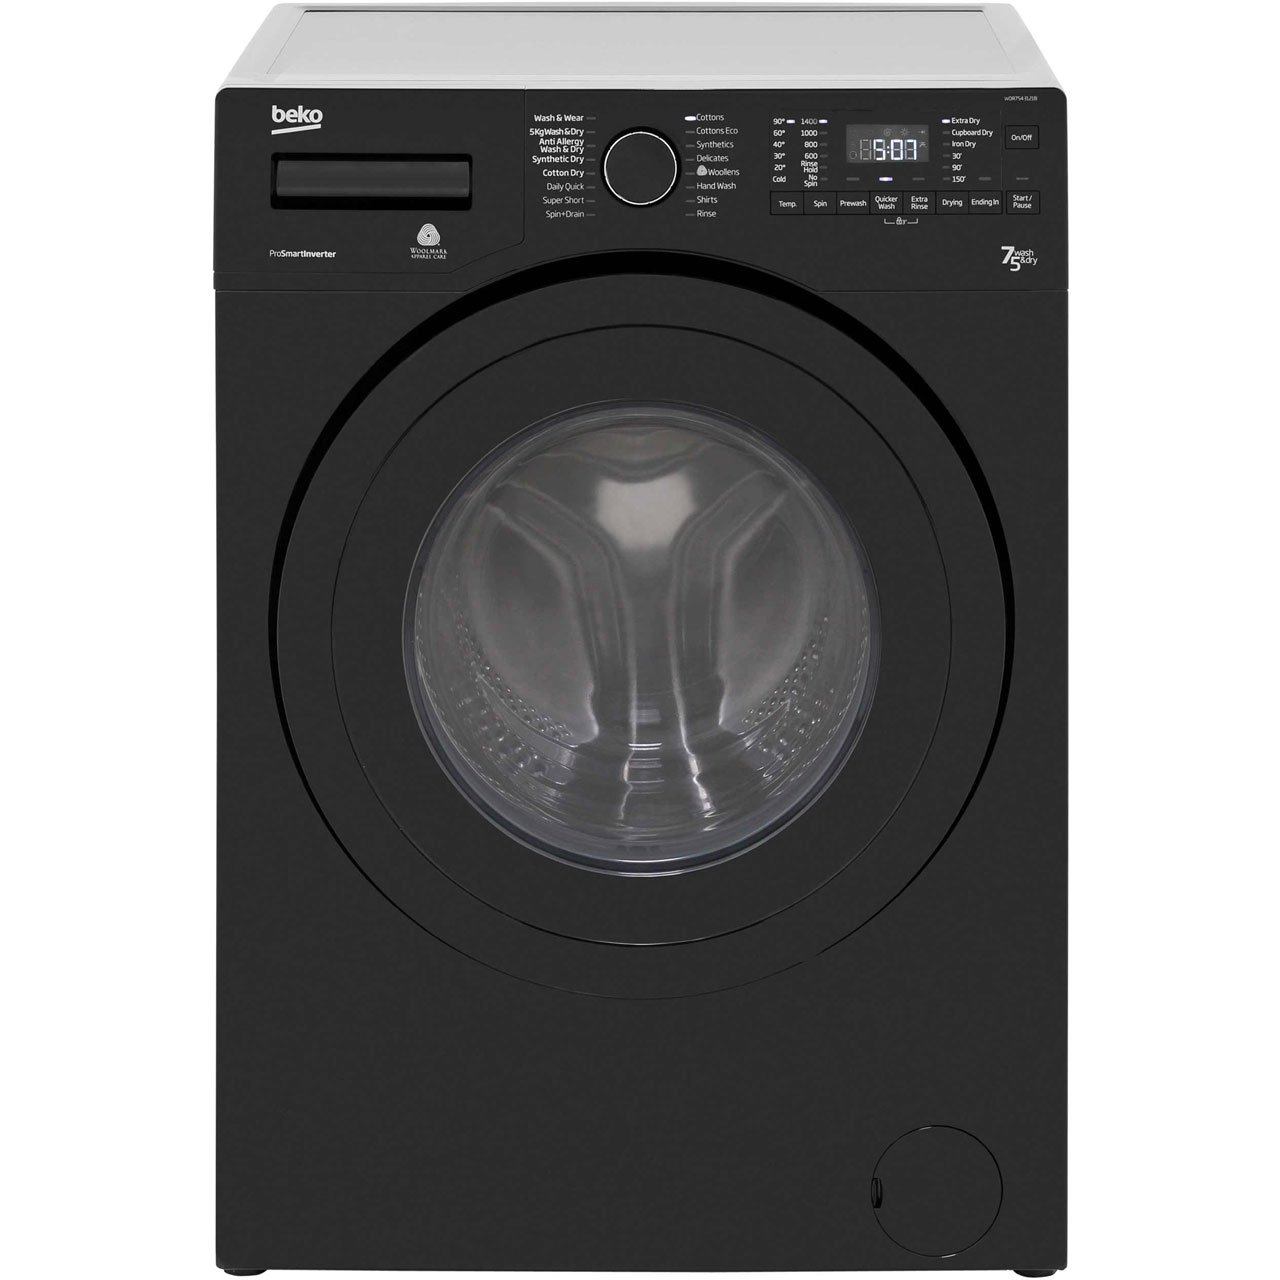 Washer Dryers Rental Goods